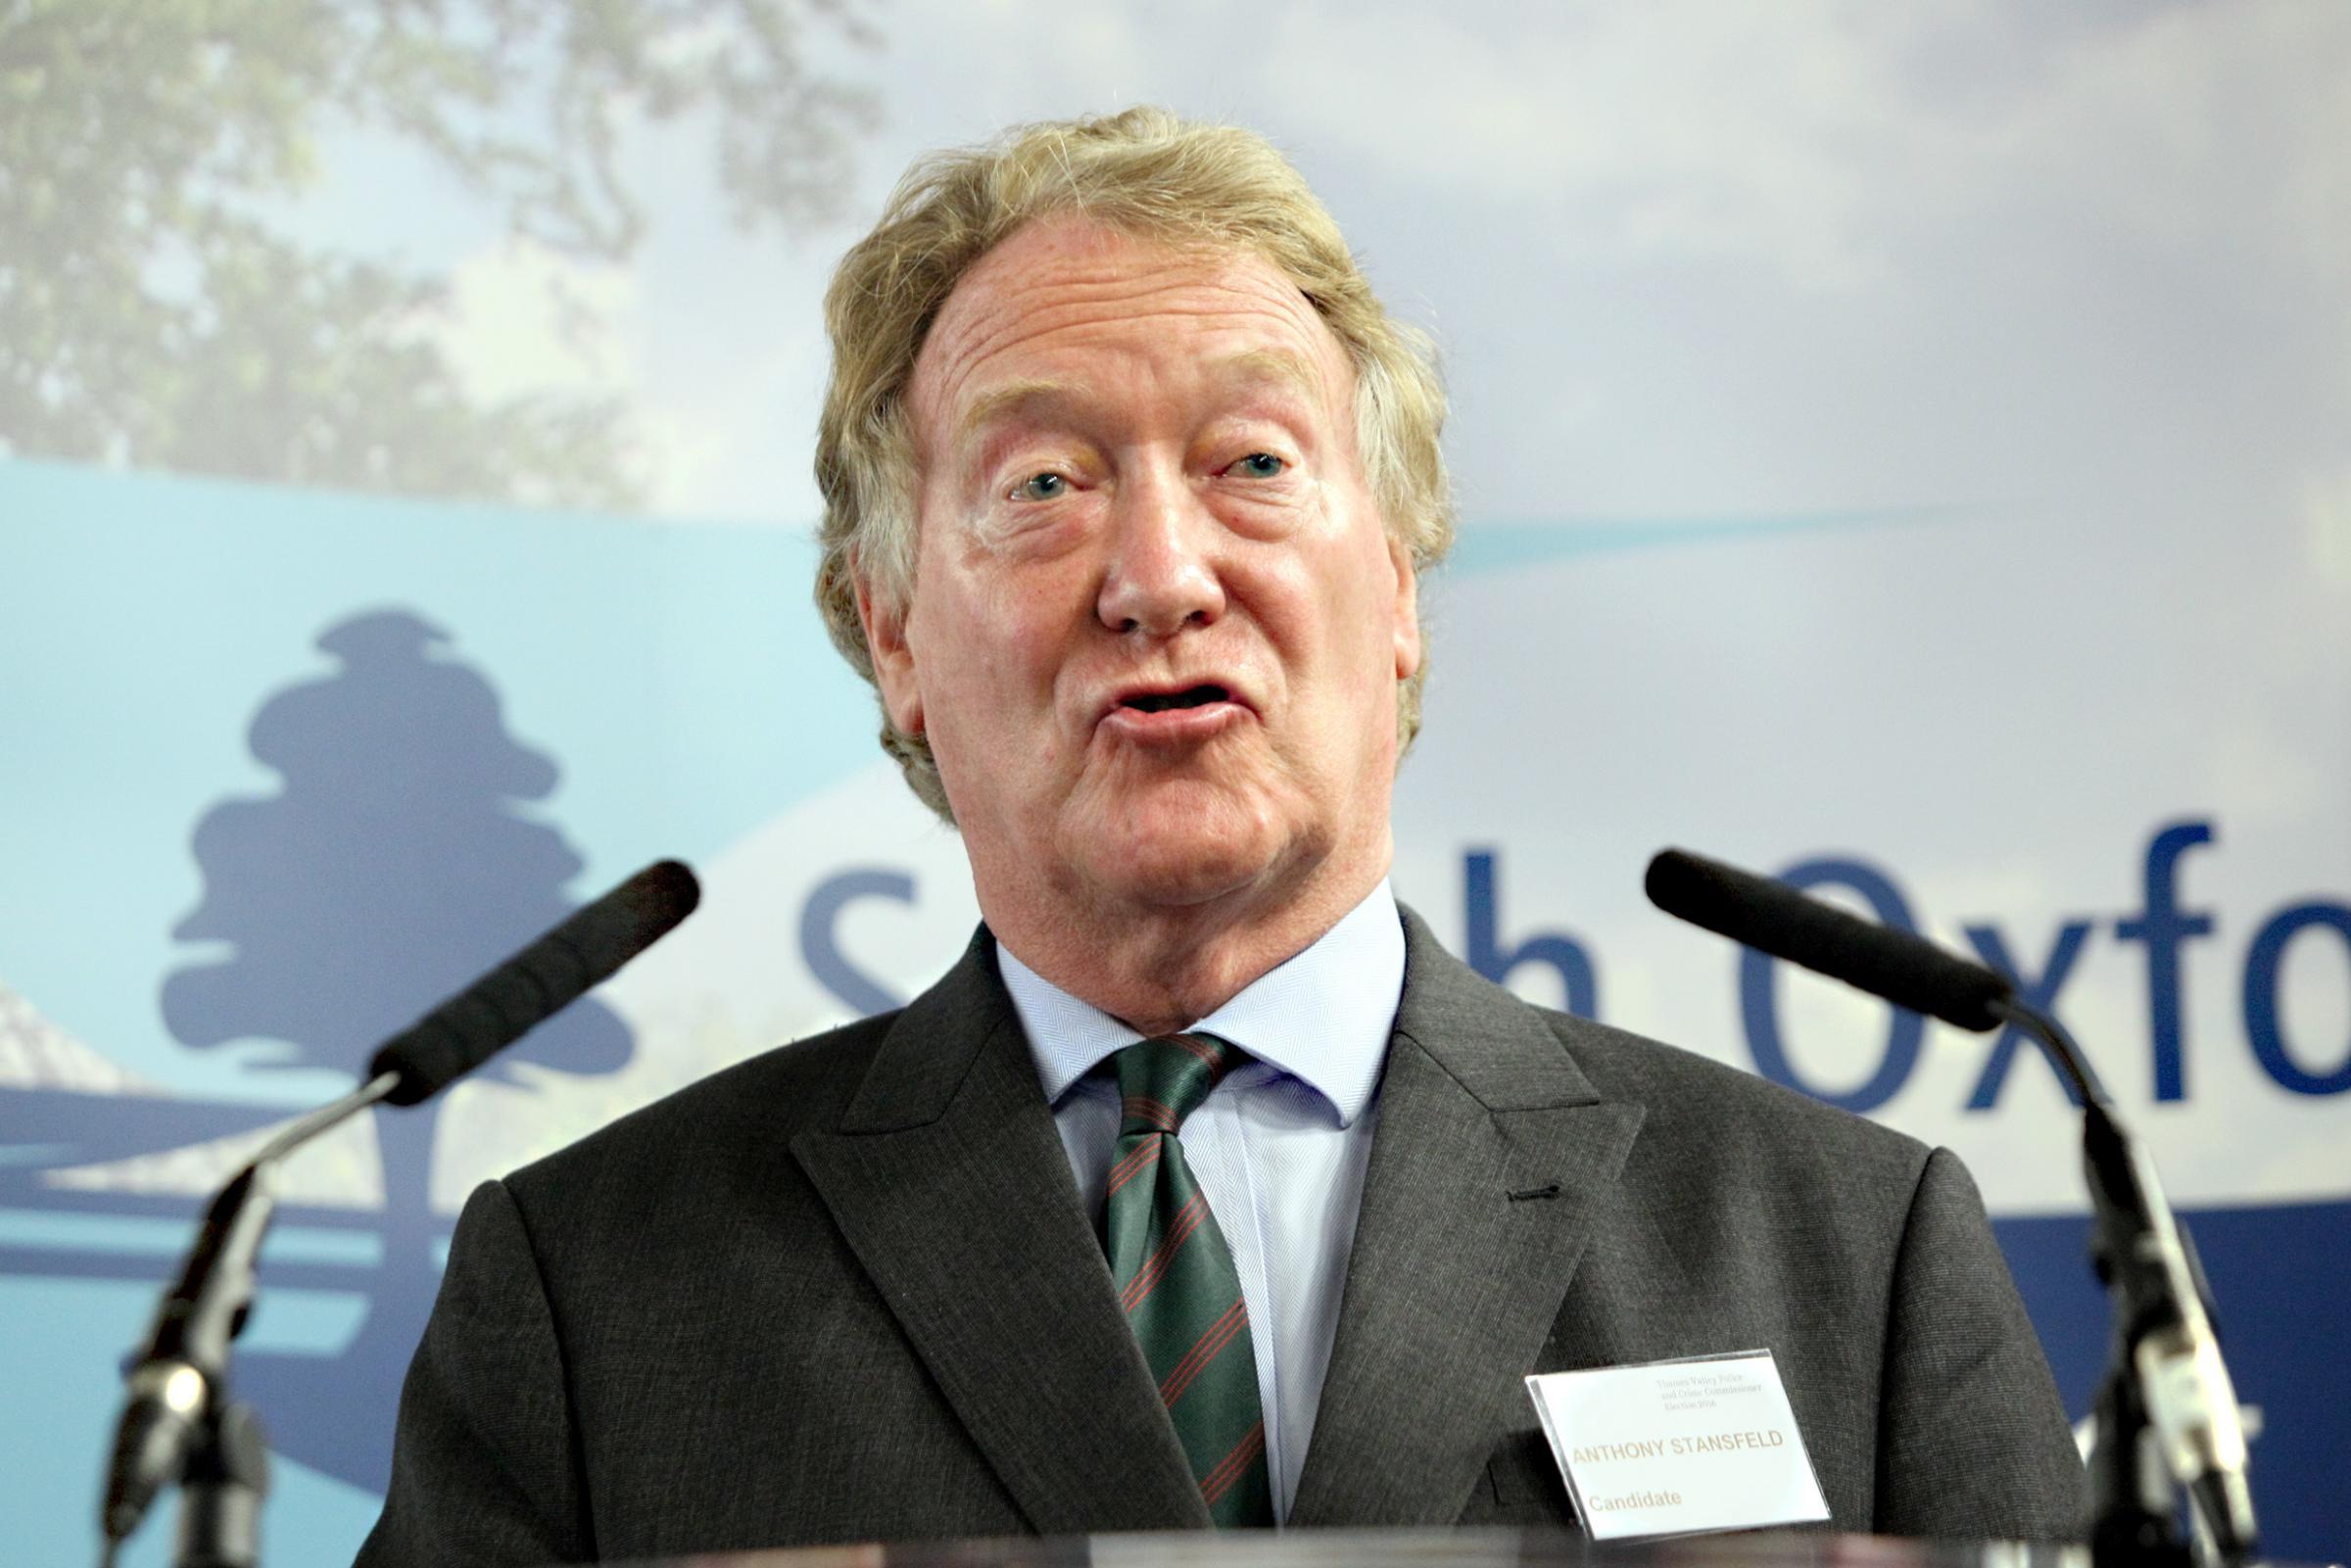 Anthony Stansfeld 'must be held accountable' says Nigel Chapman